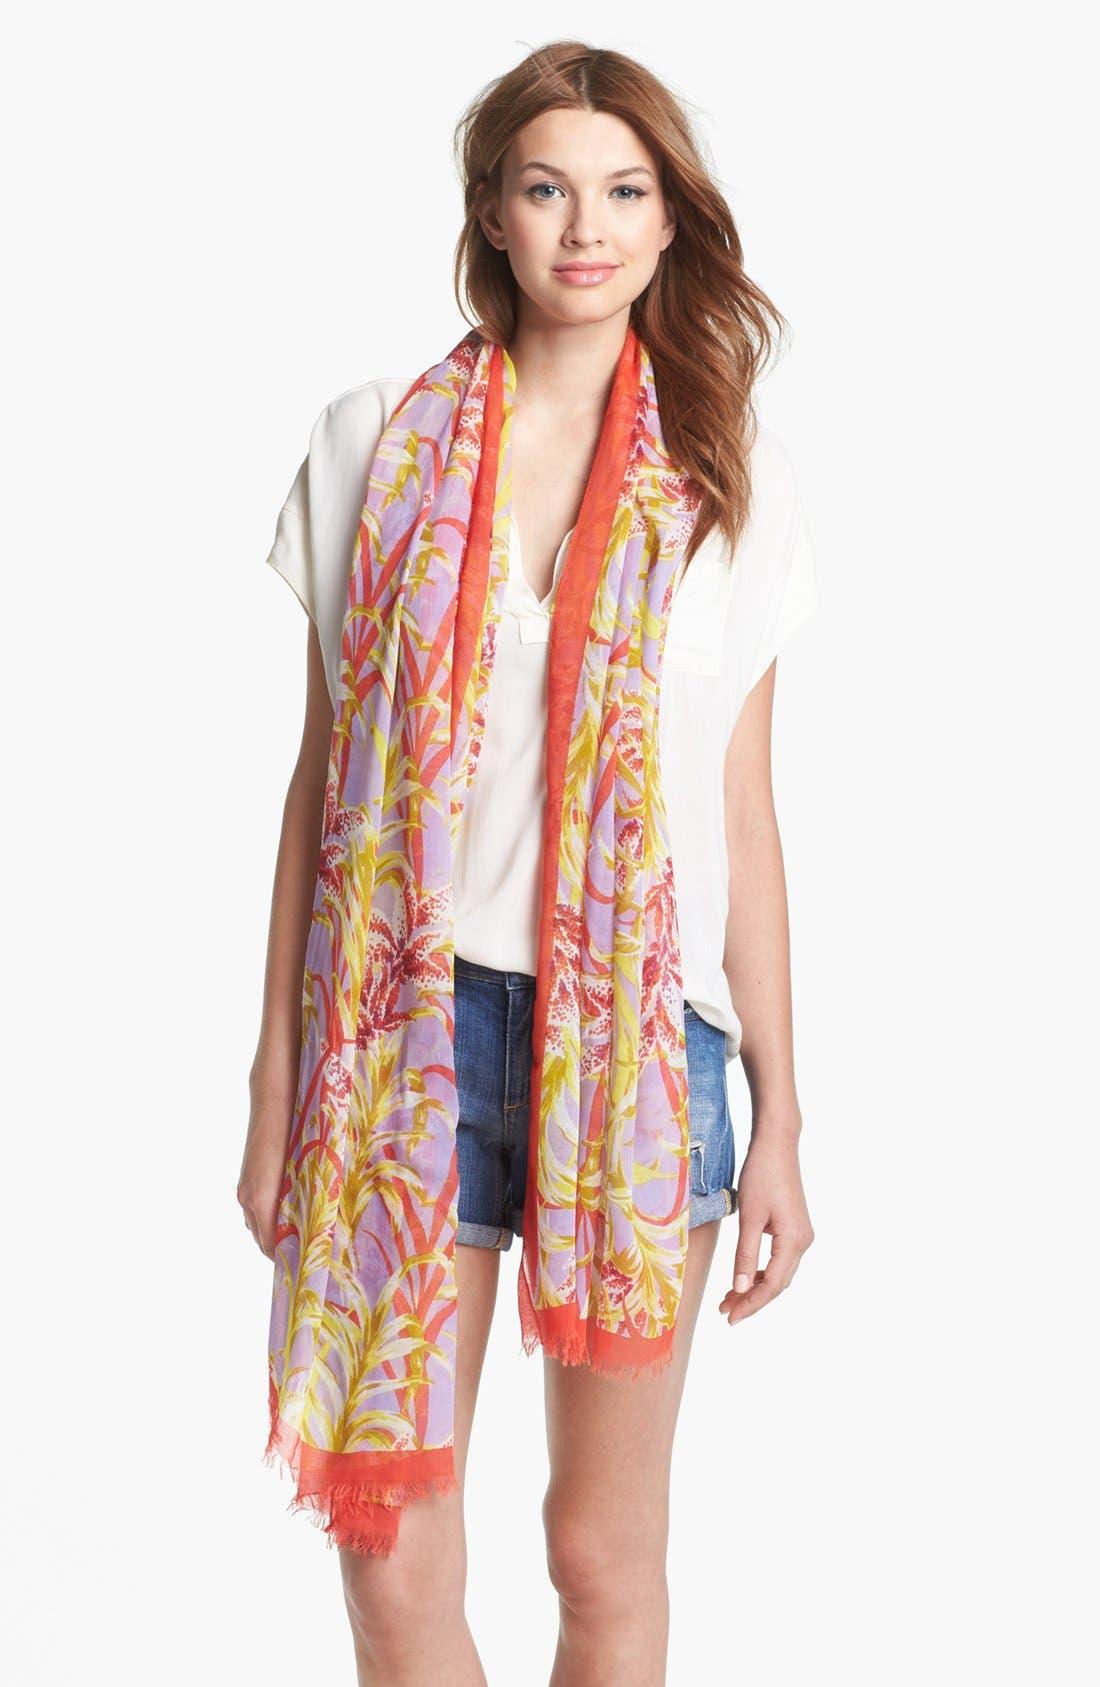 Alternate Image 1 Selected - kate spade new york 'ginger floral' scarf